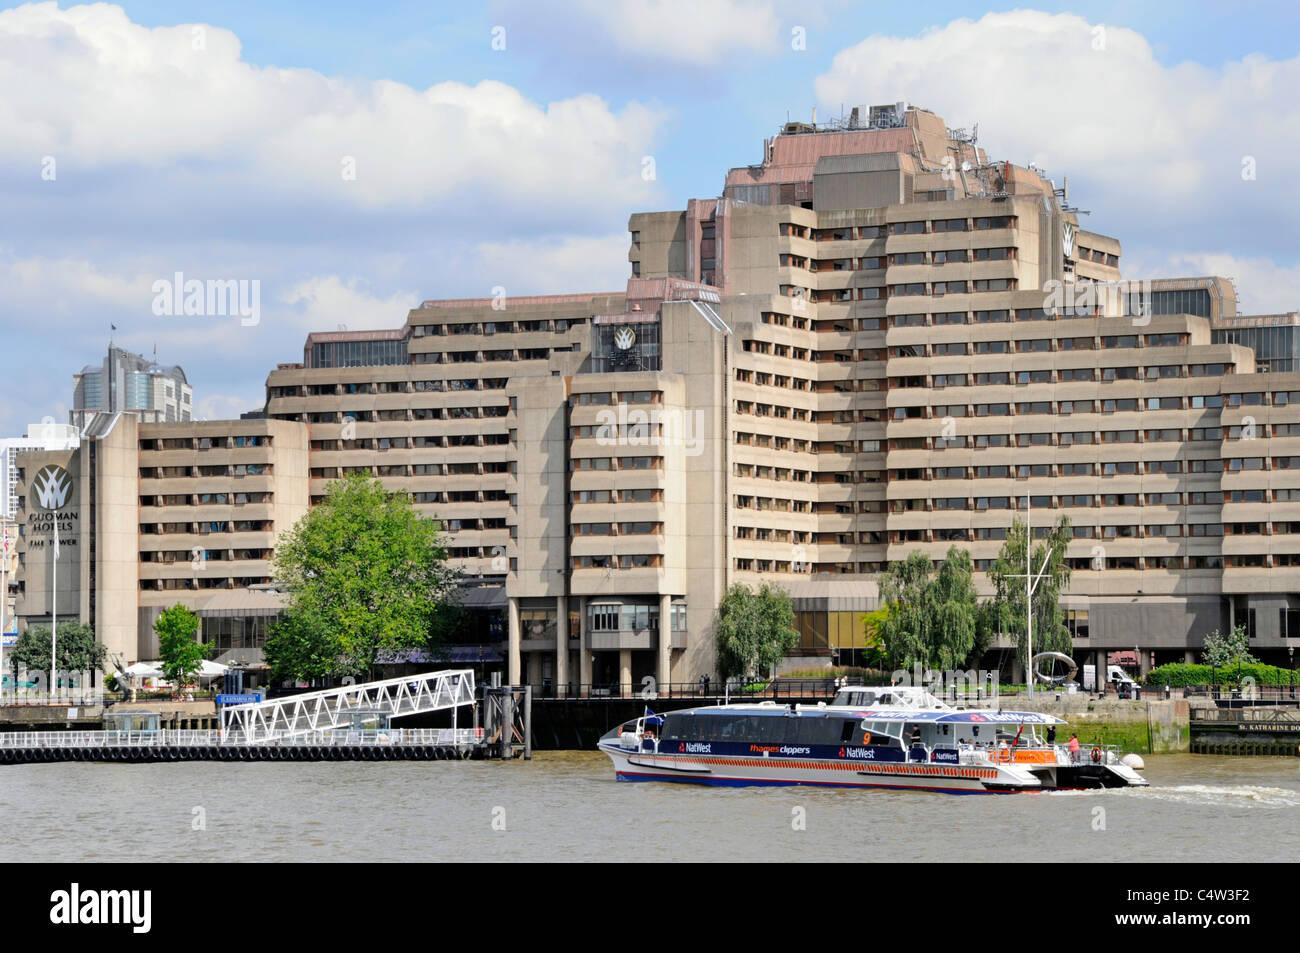 The Guoman Hotel London